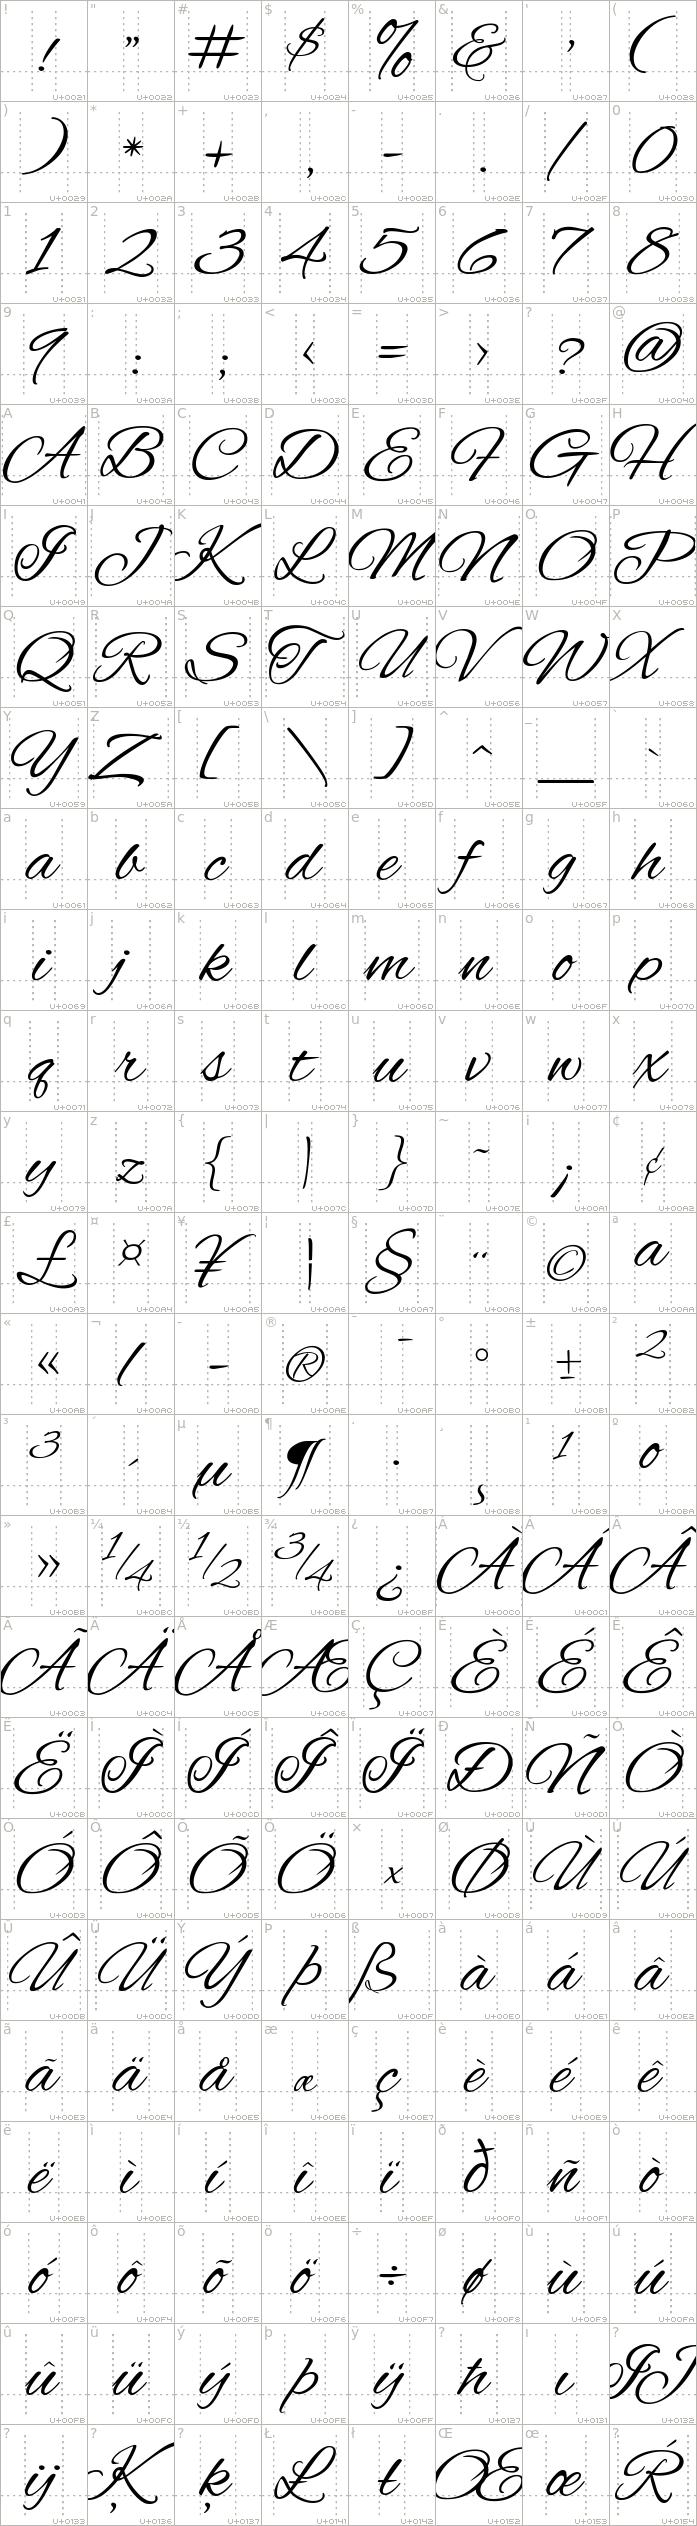 alex-brush.regular.character-map-1